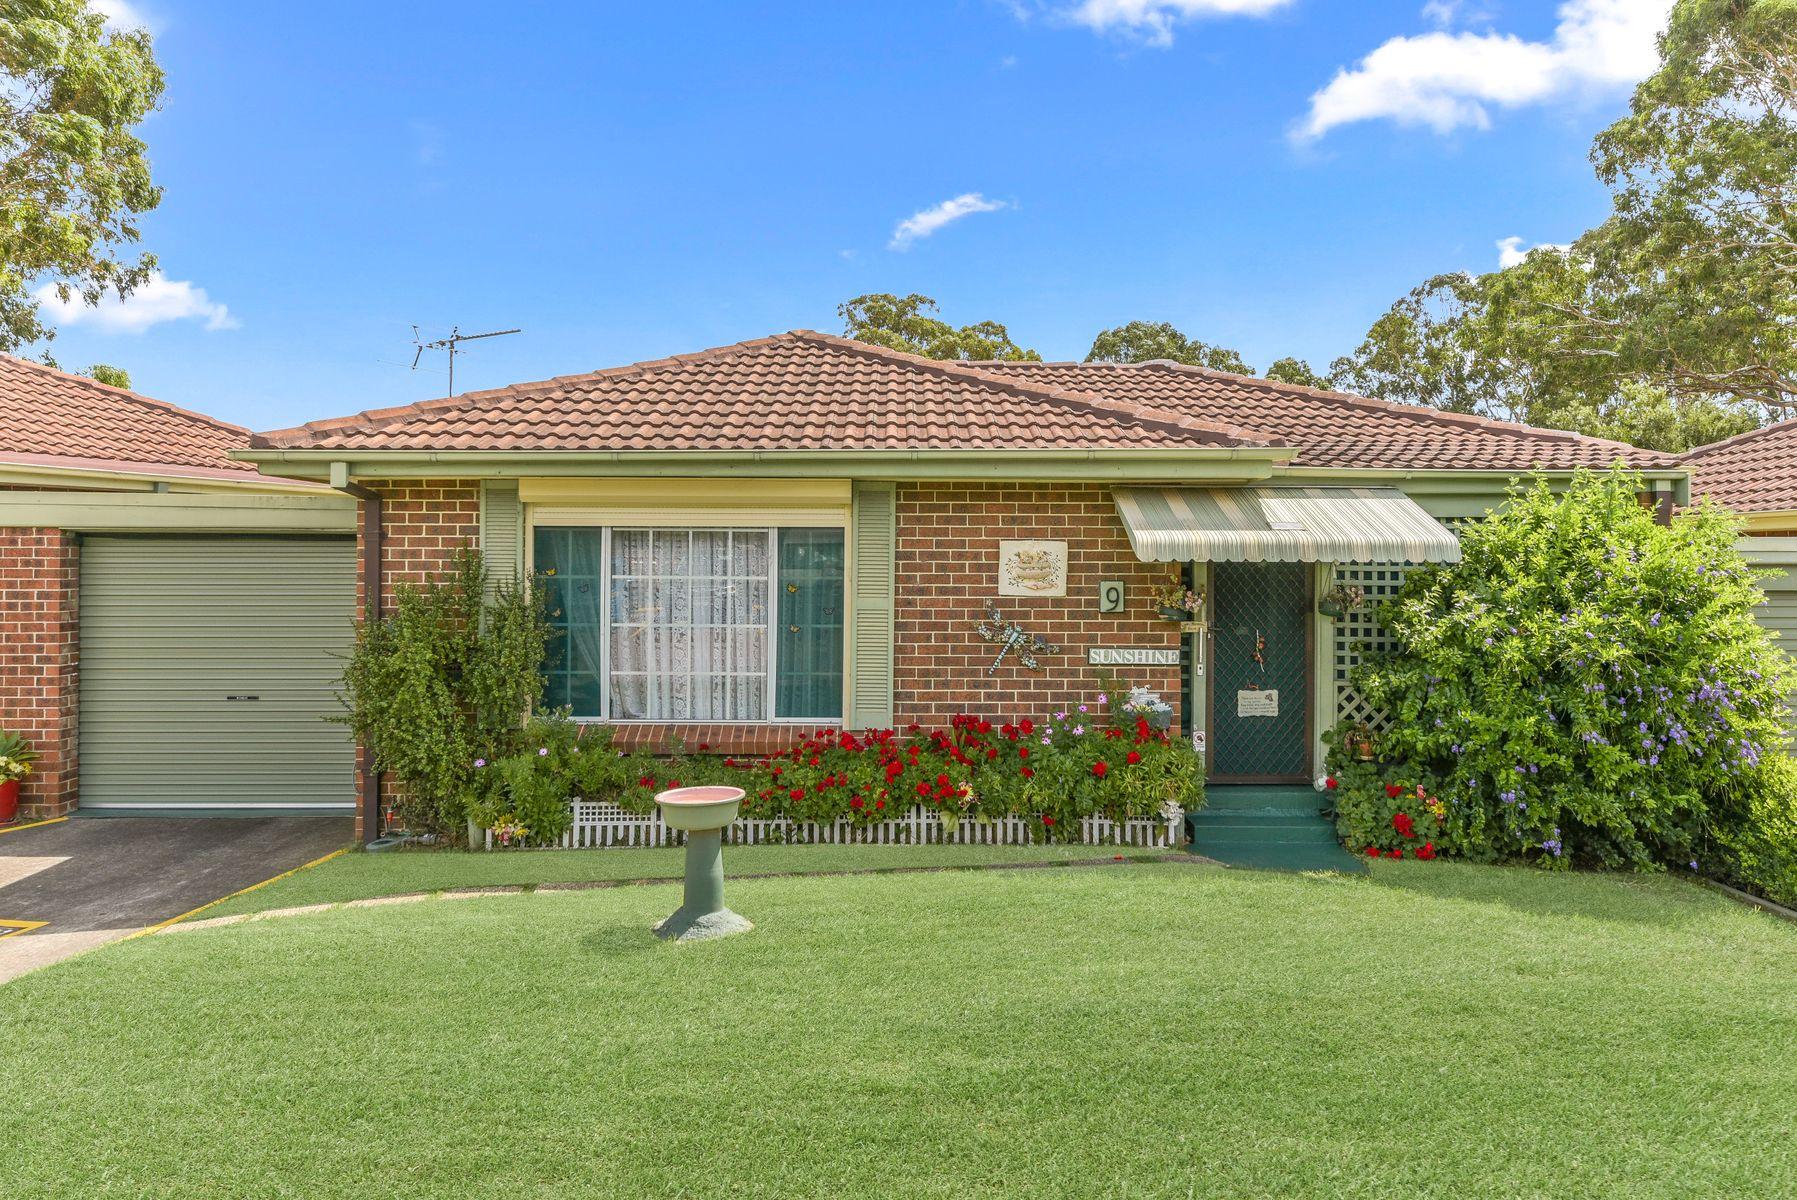 9/12 Bensley Road, Macquarie Fields, NSW 2564